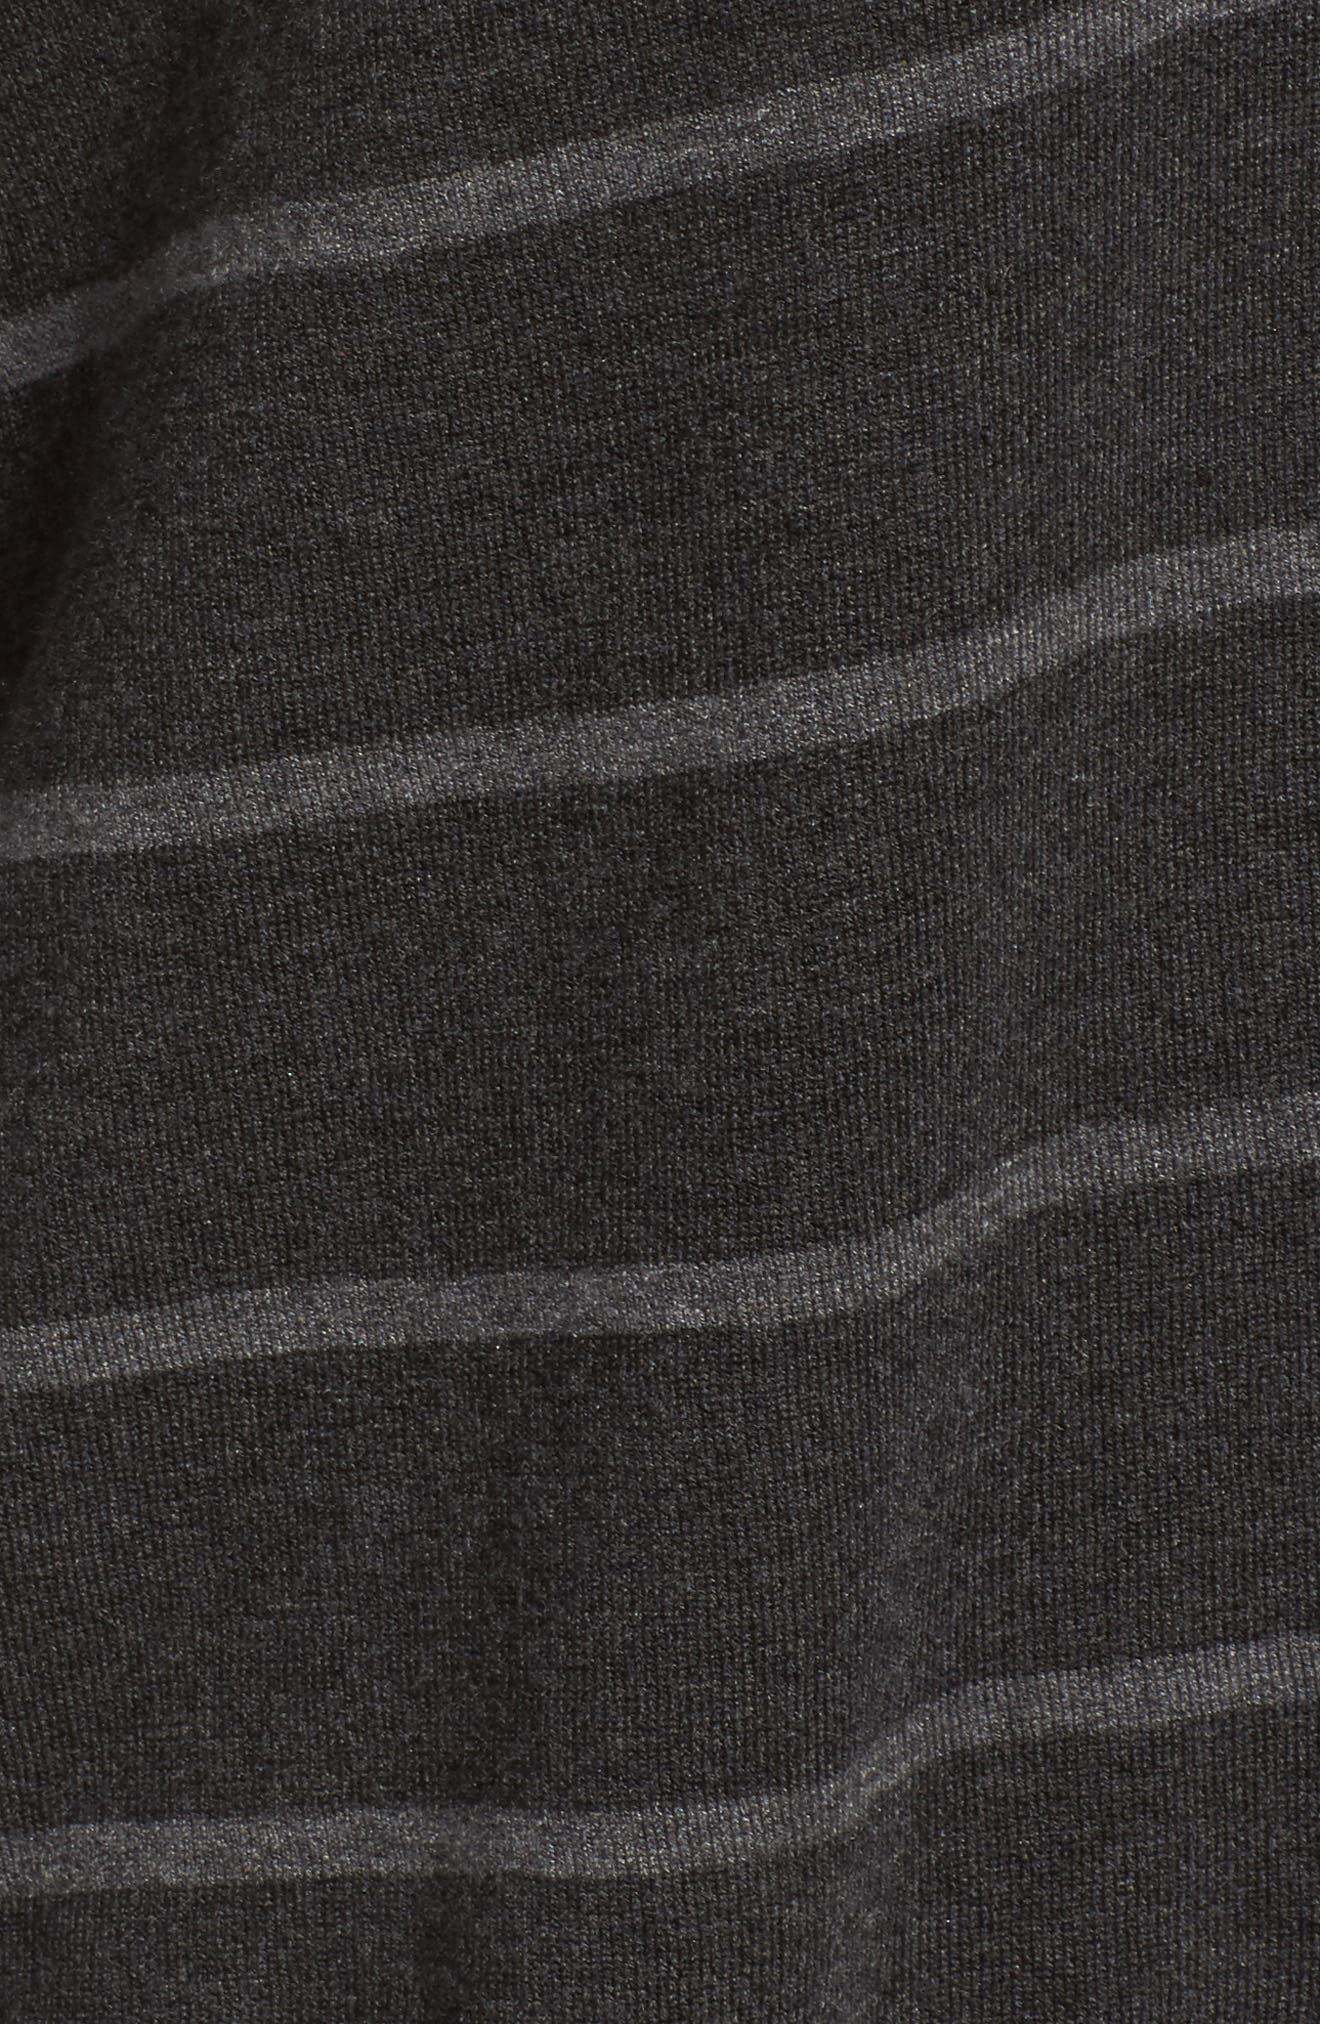 Stripe Tencel<sup>®</sup> Blend Crop Sweater,                             Alternate thumbnail 5, color,                             064